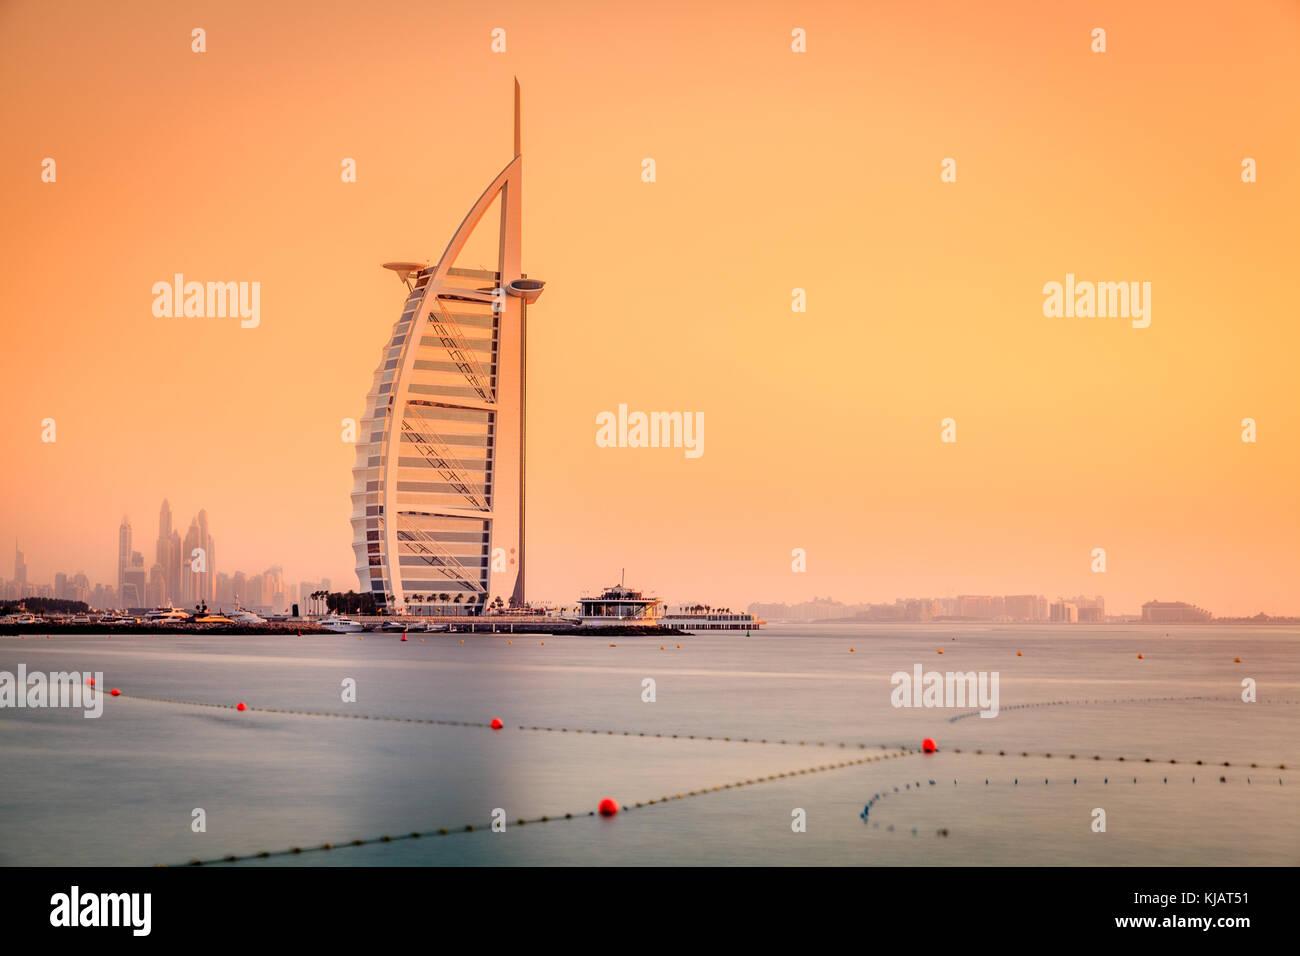 Dubai, Emiratos Árabes Unidos, Junio 7, 2016: Vista del mundialmente famoso Hotel Burj Al Arab al atardecer Imagen De Stock